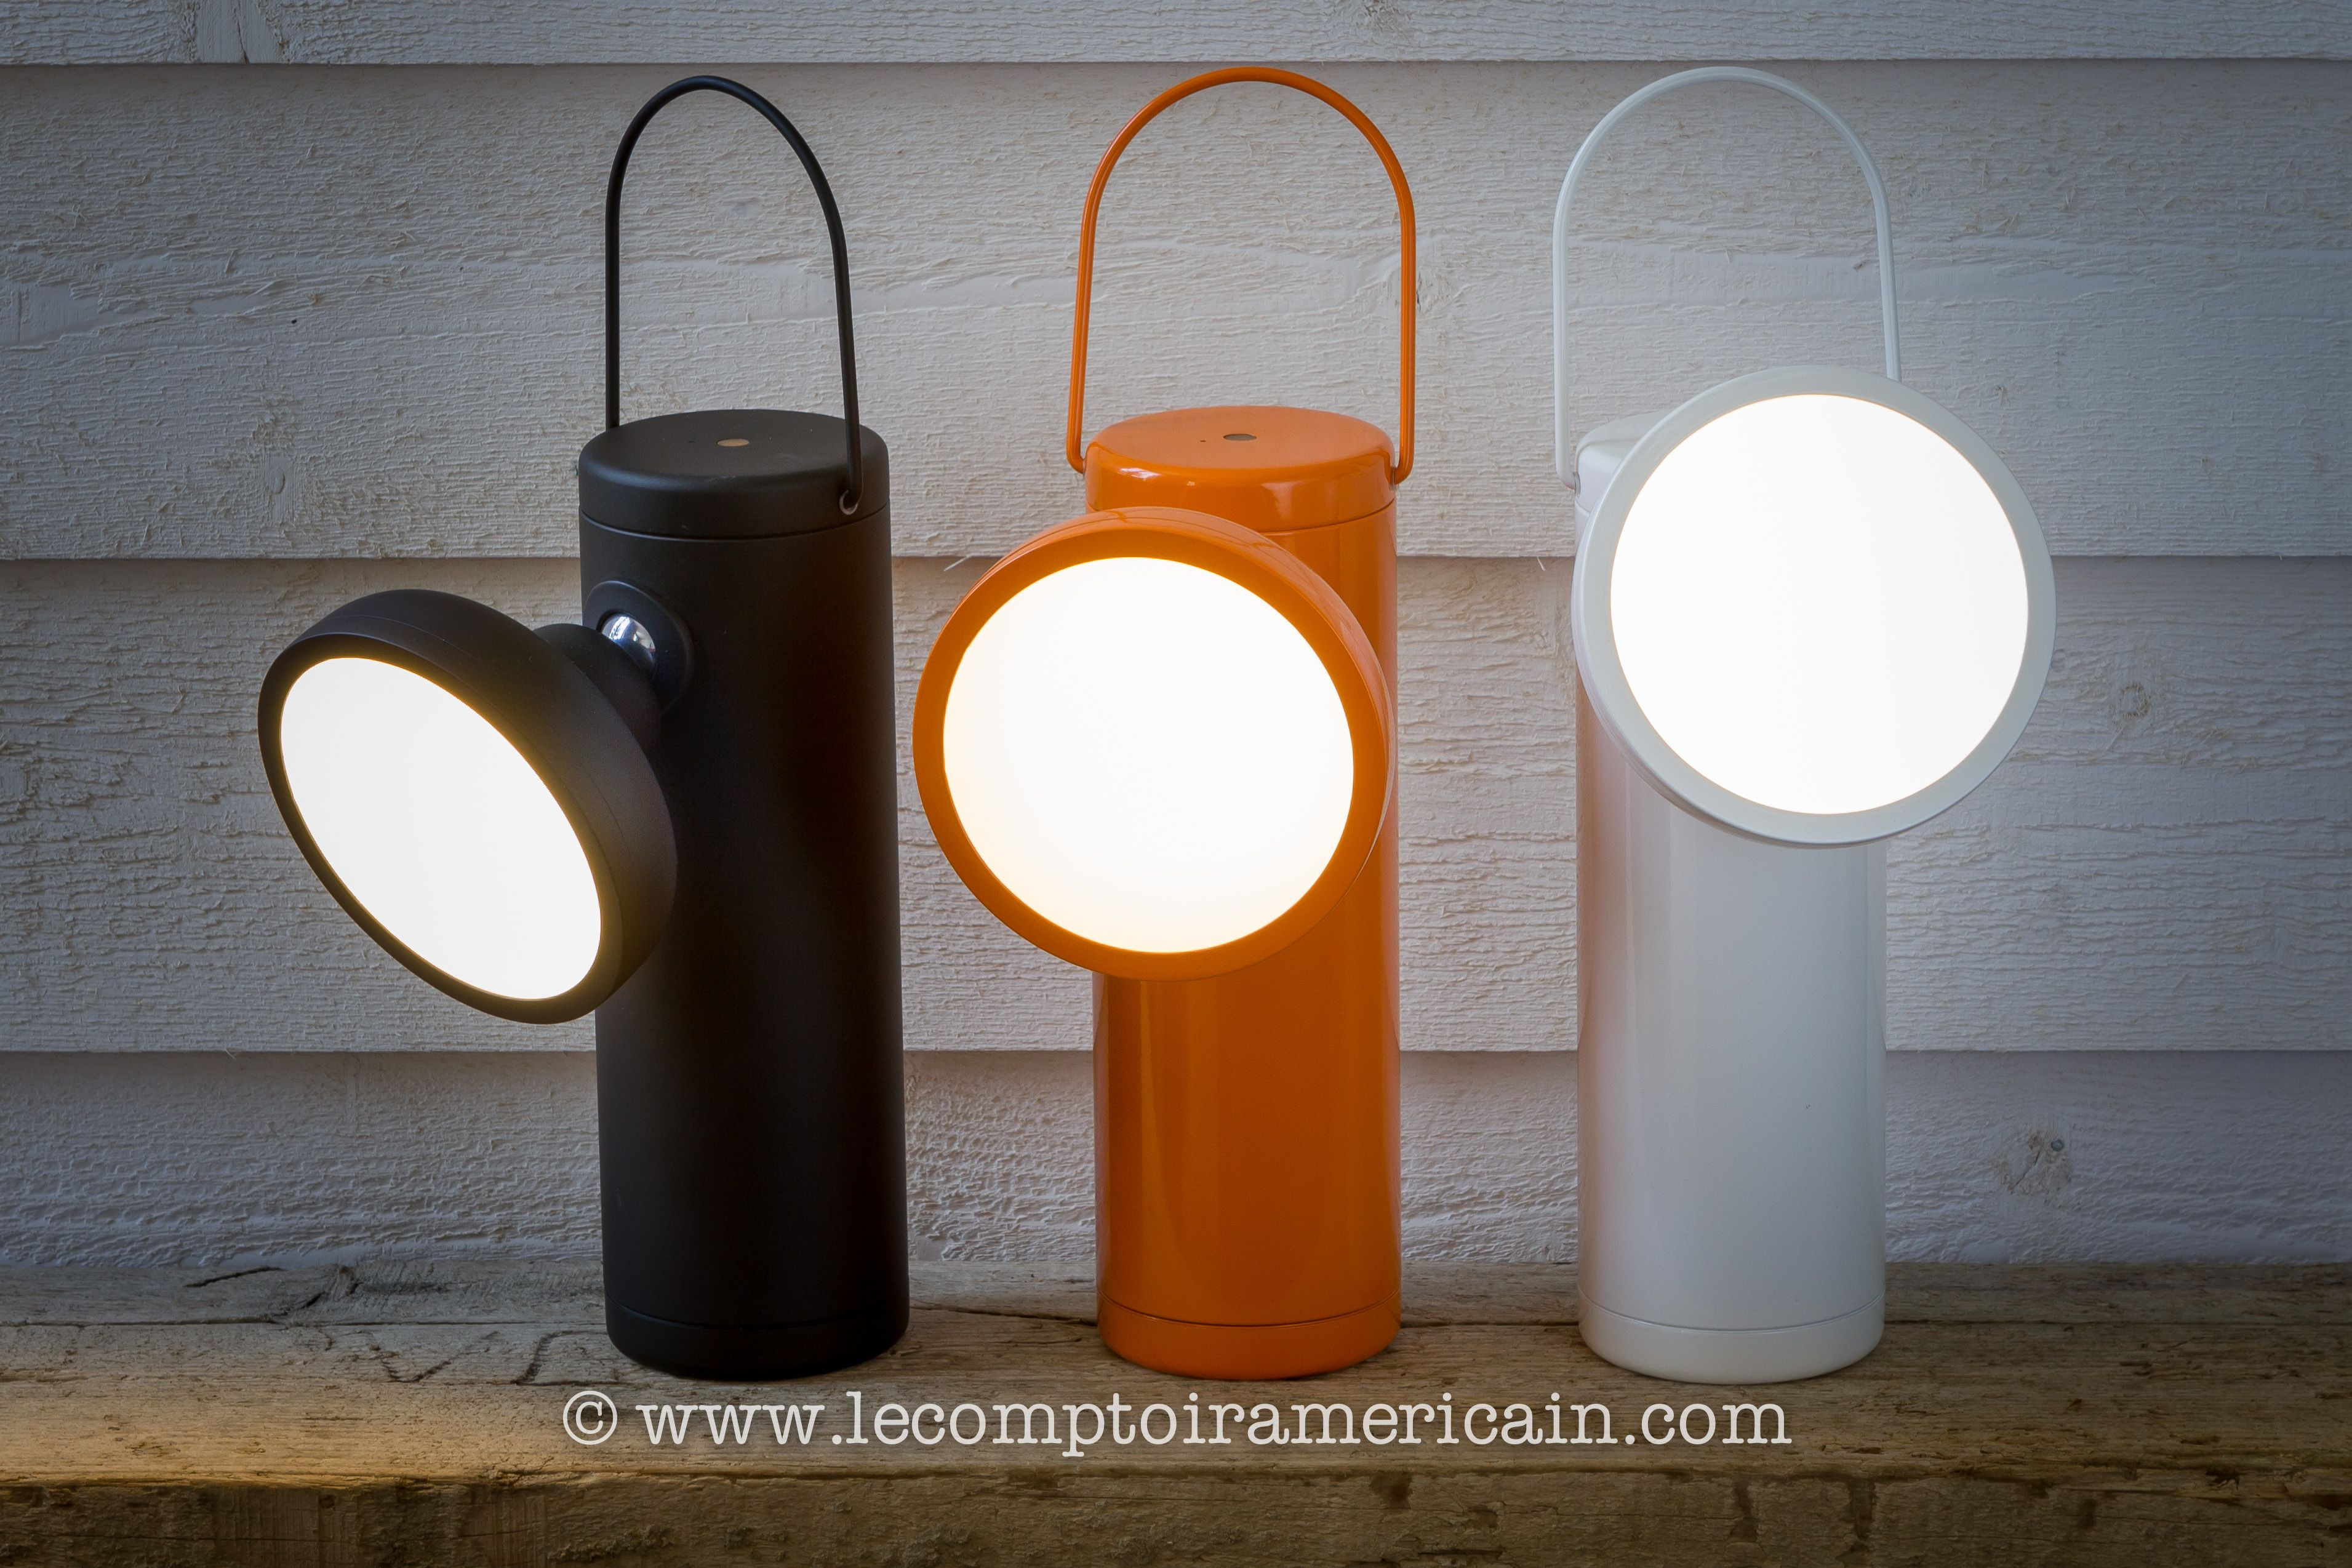 Lampe de mineur à led & batterie #madeincanada #canadaproduct #design #lampdesign #lecomptoiramericain #home #homedesign #led #lampe #eclairage #juniperdesign